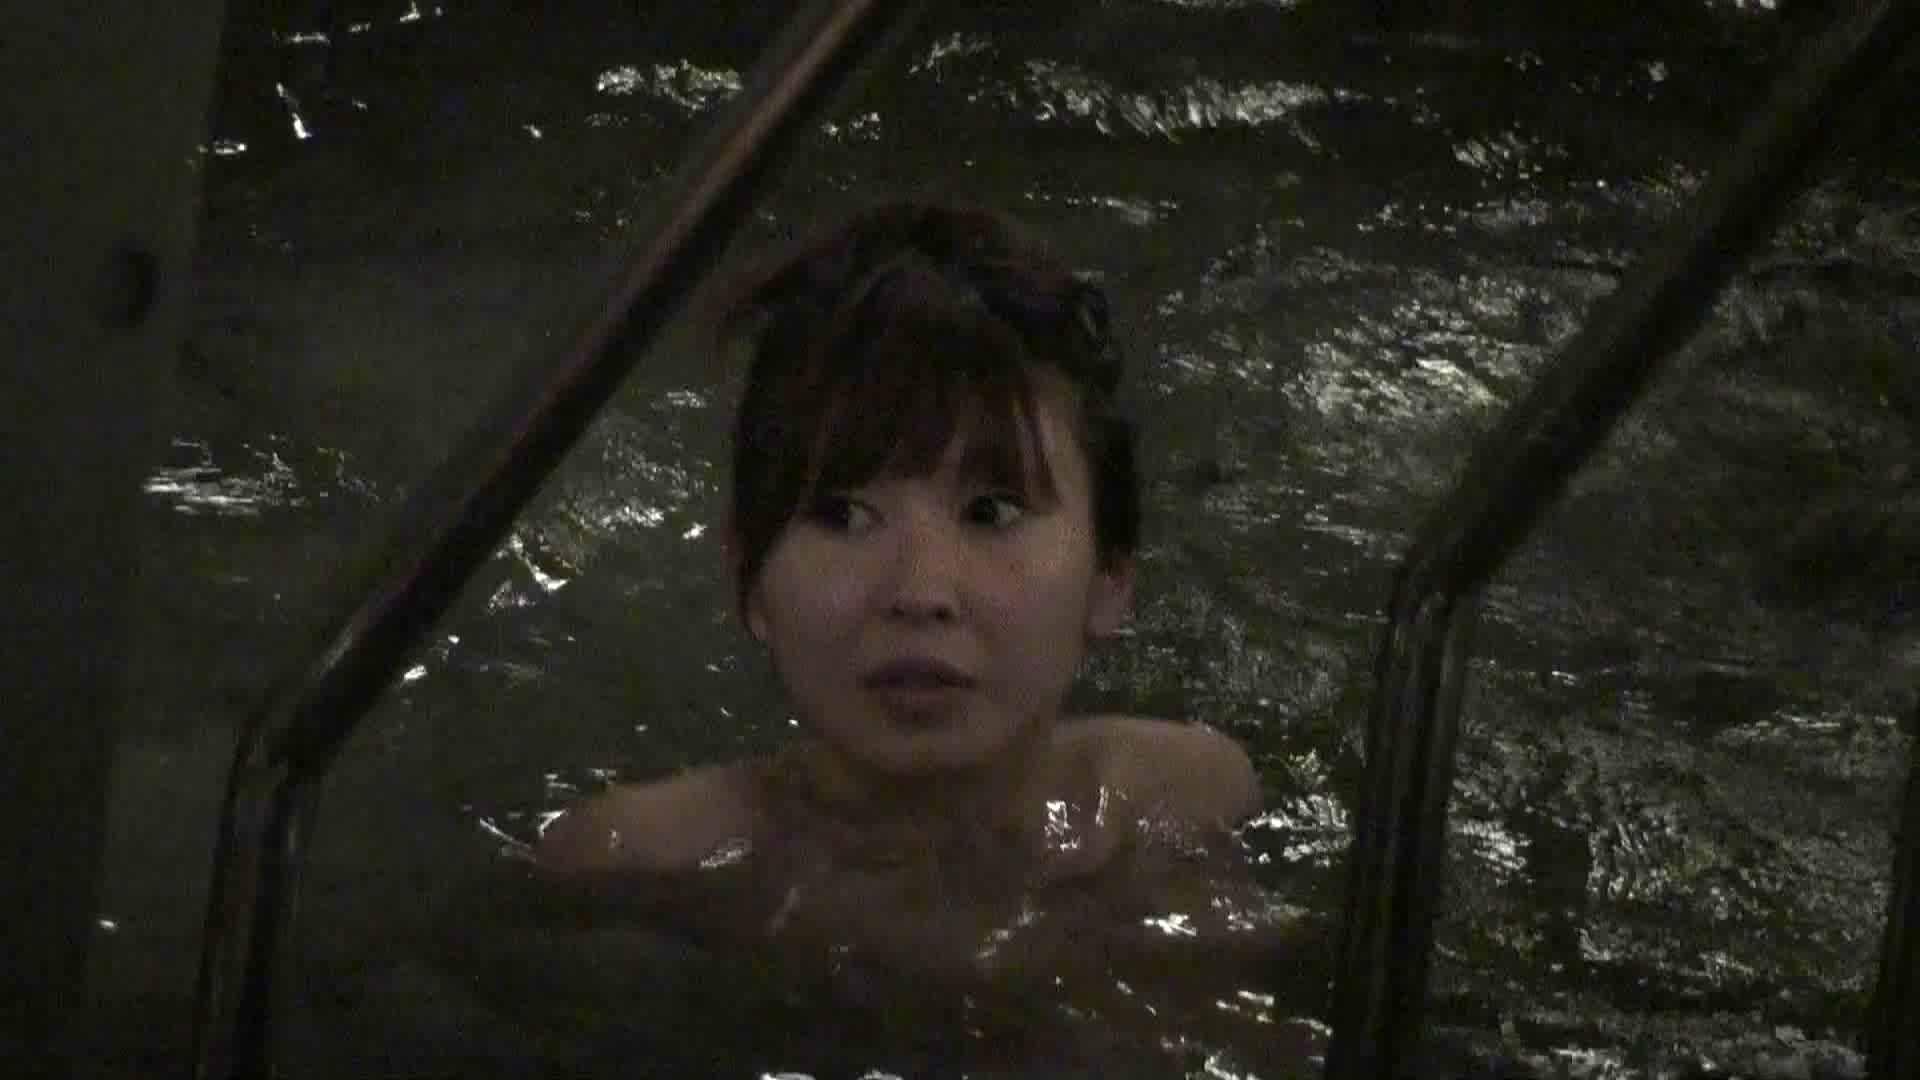 Aquaな露天風呂Vol.410 露天 | 盗撮特撮  11pic 7